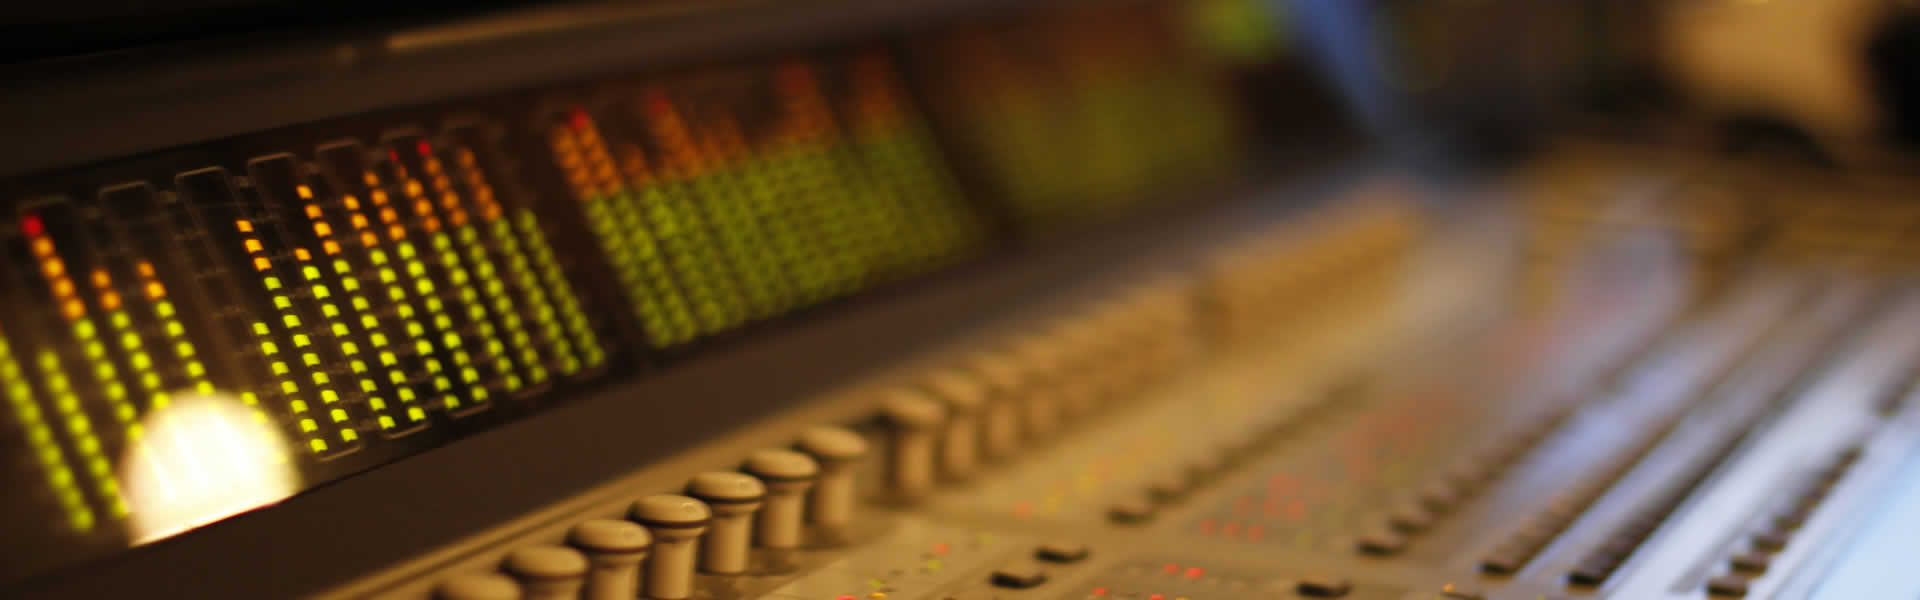 Recording Studios In Rhode Island